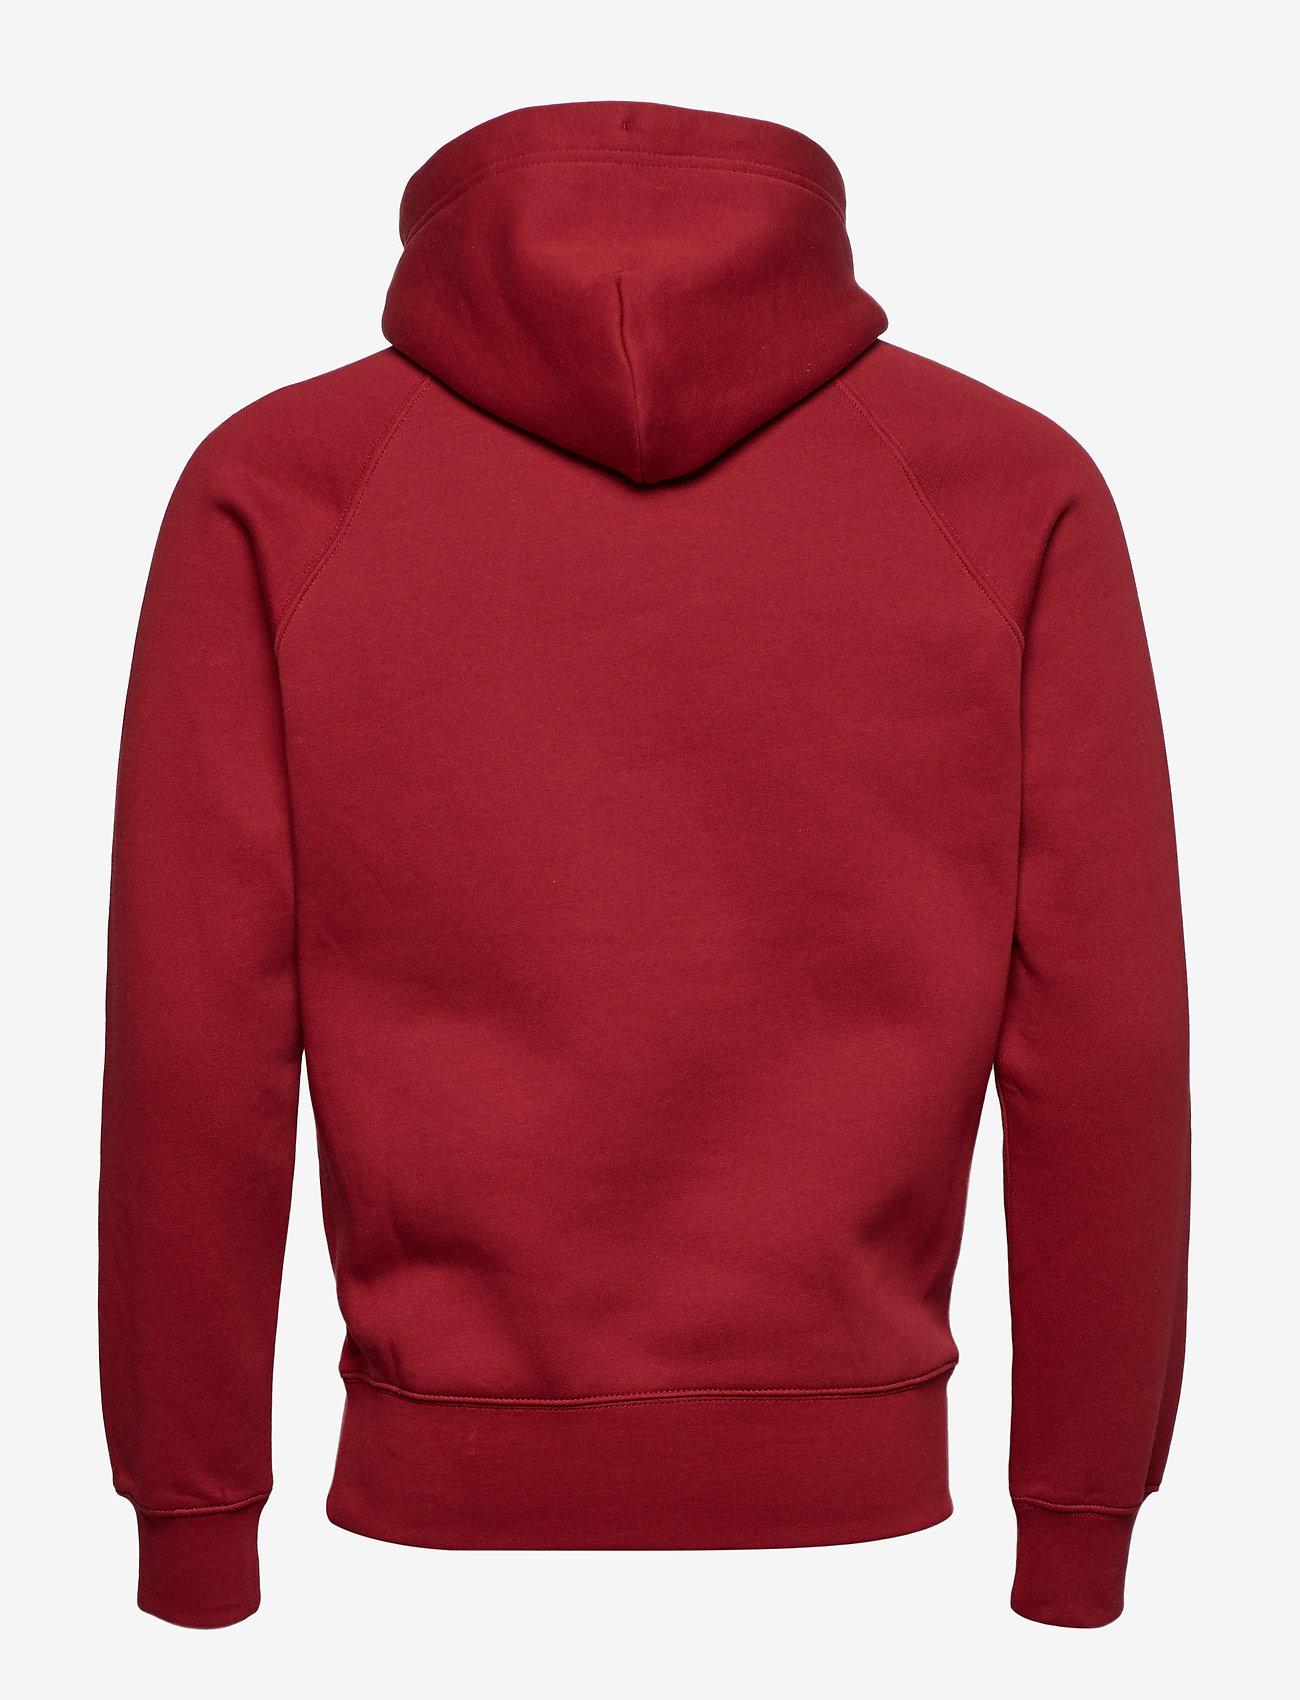 GANT - SHIELD HOODIE - hoodies - mahogany red - 1